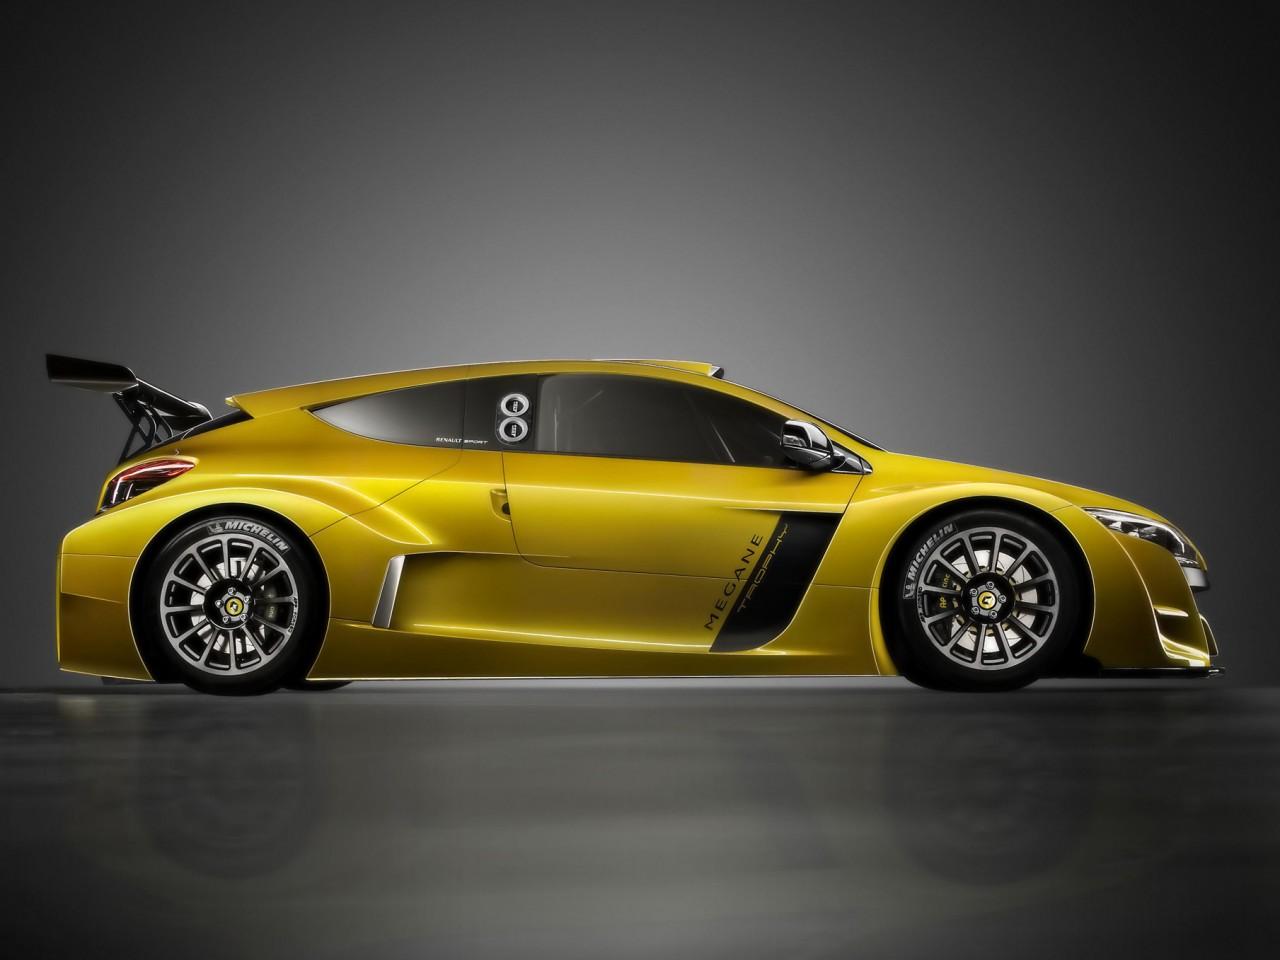 renault megane trophy sport auto photos 7 on better parts ltd. Black Bedroom Furniture Sets. Home Design Ideas